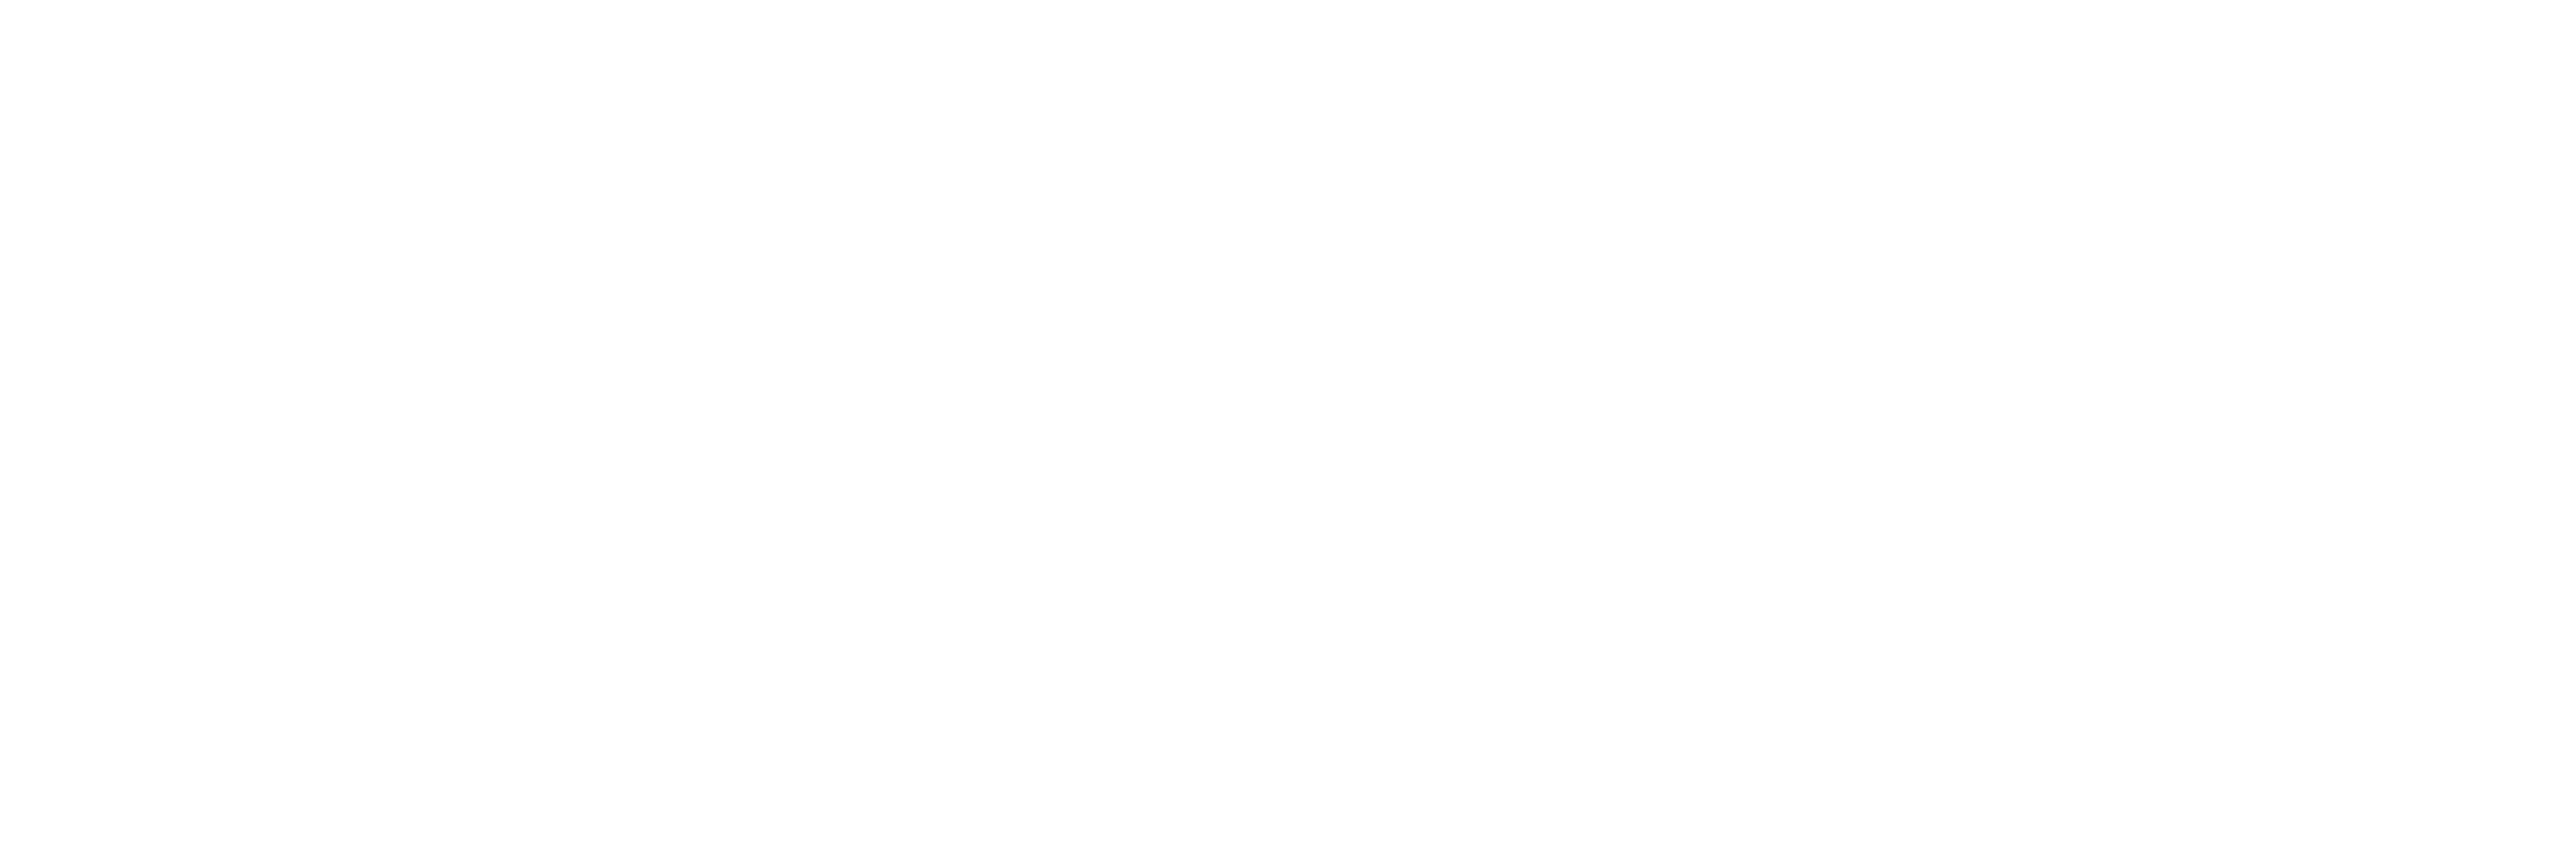 Weightless Recordings